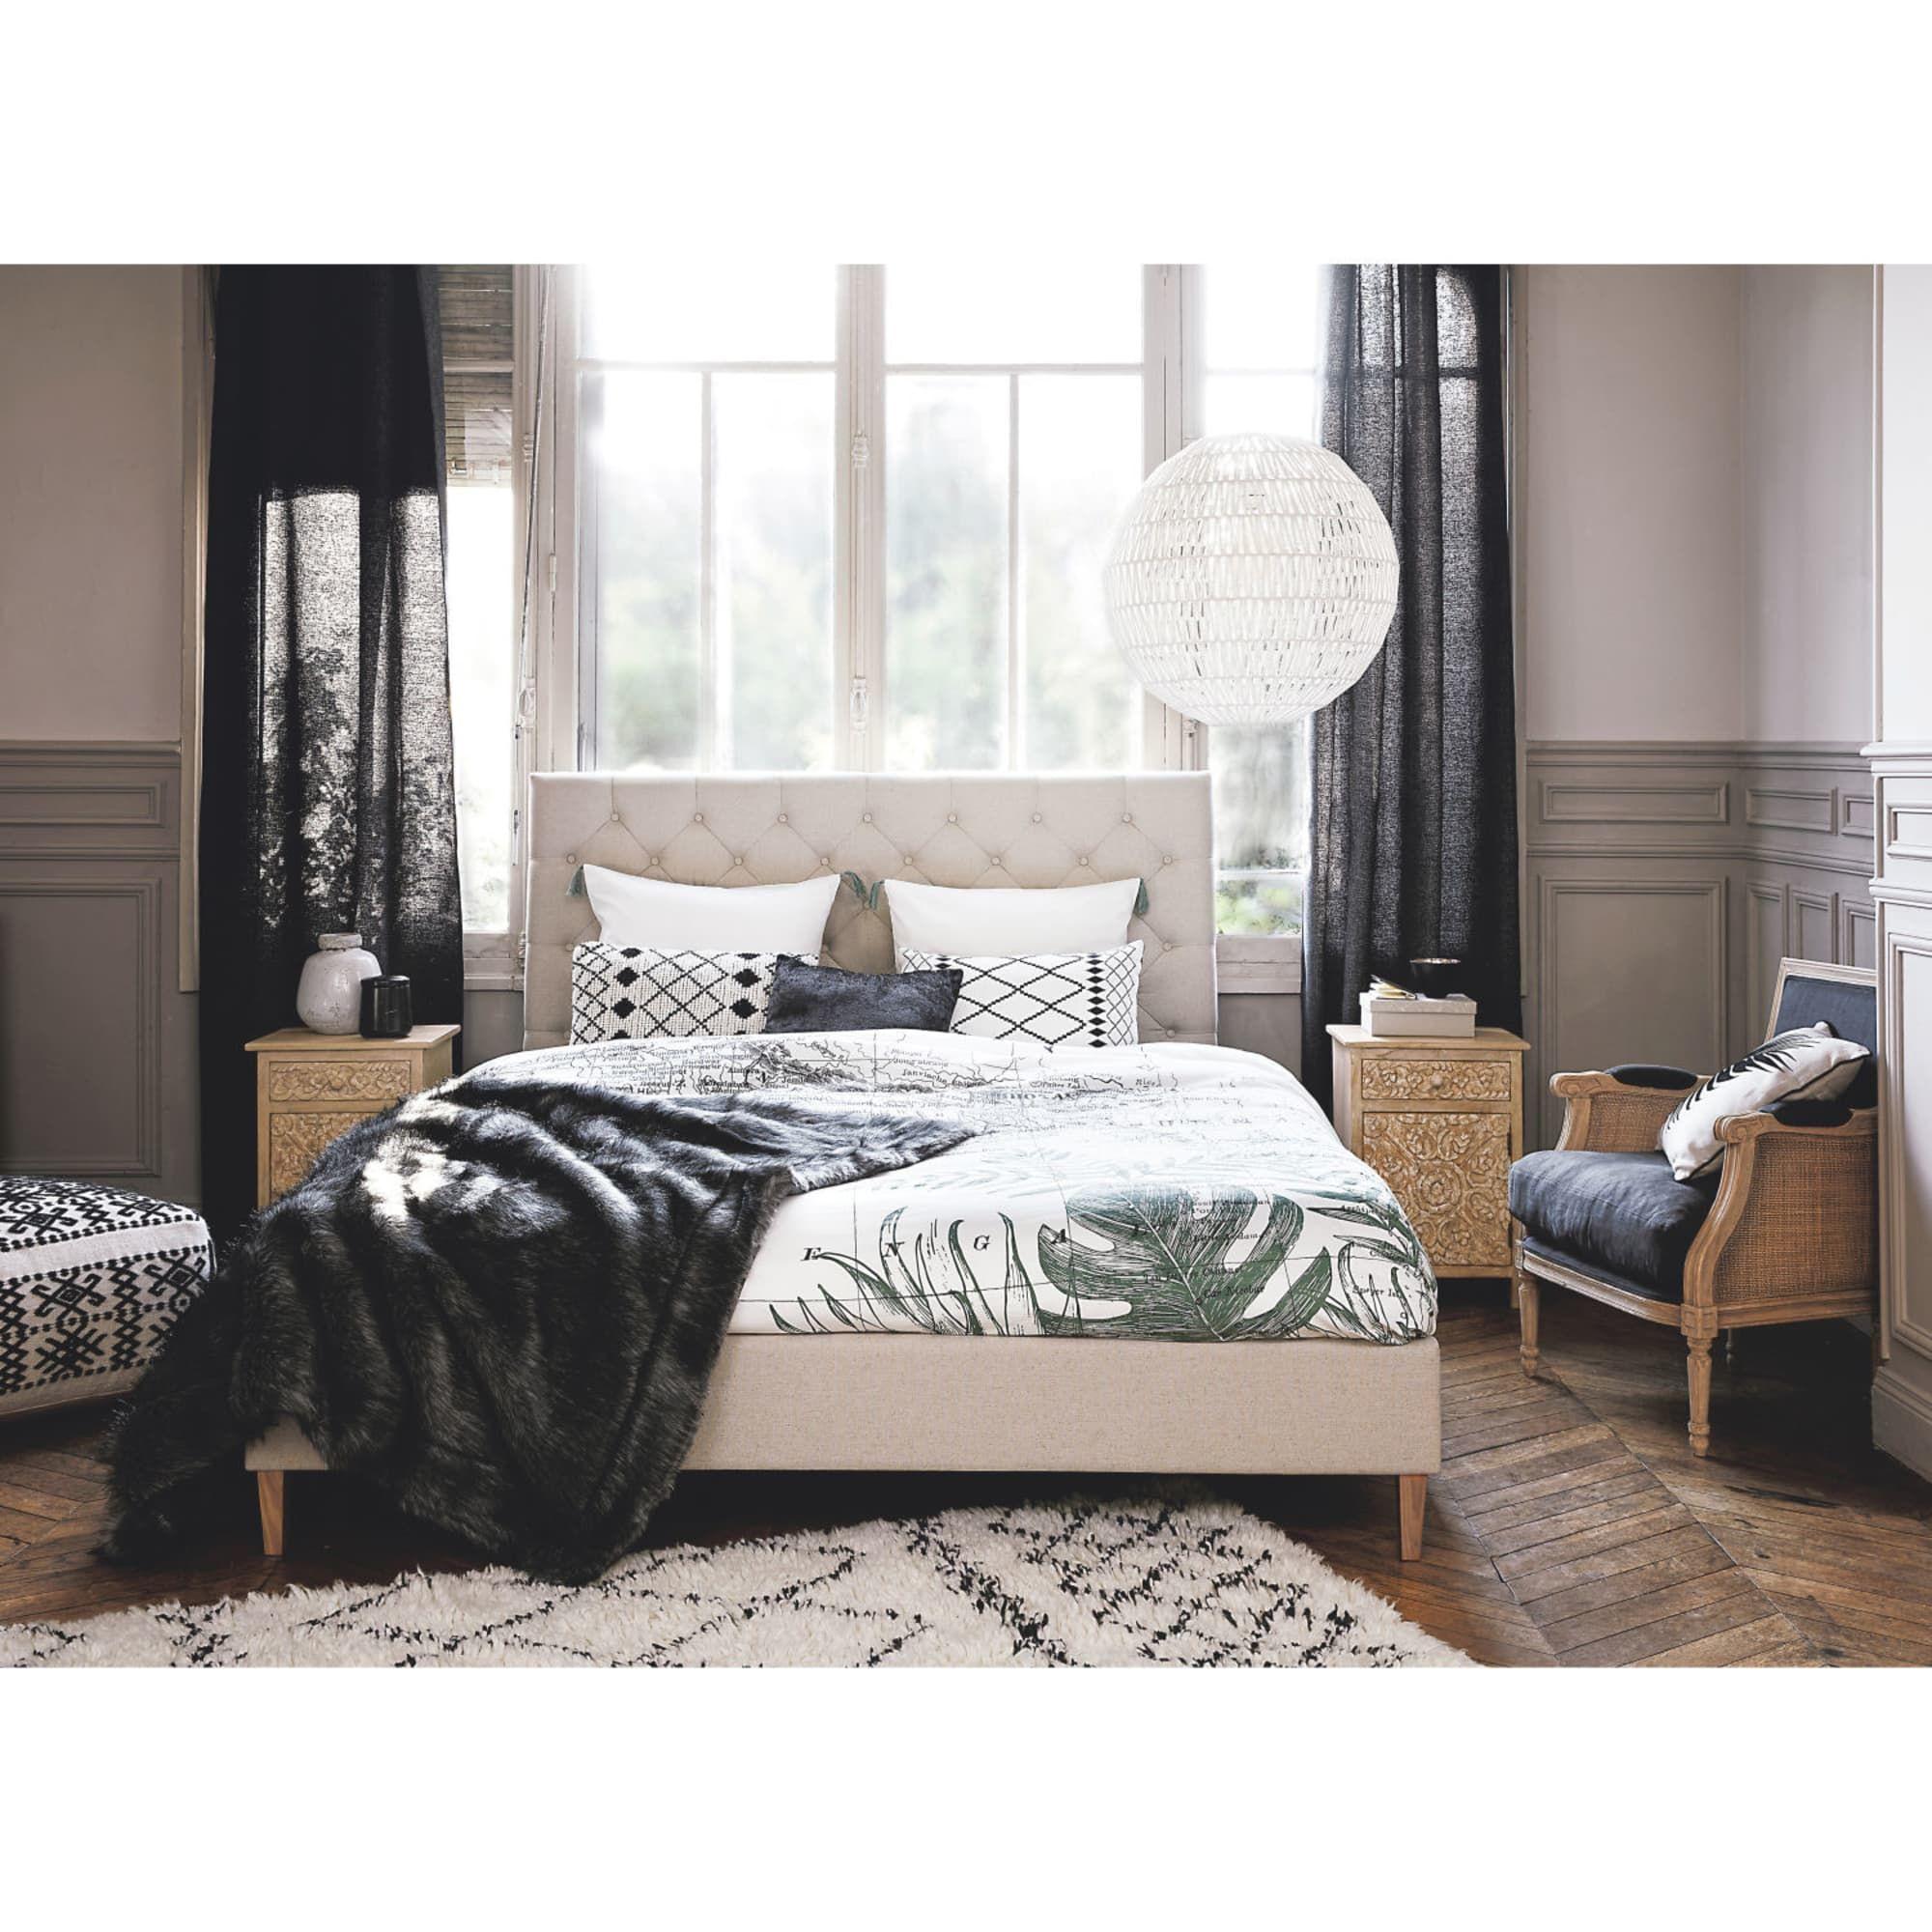 Bett mit gestepptem mit Lattenrost, 180x200 Bett ideen